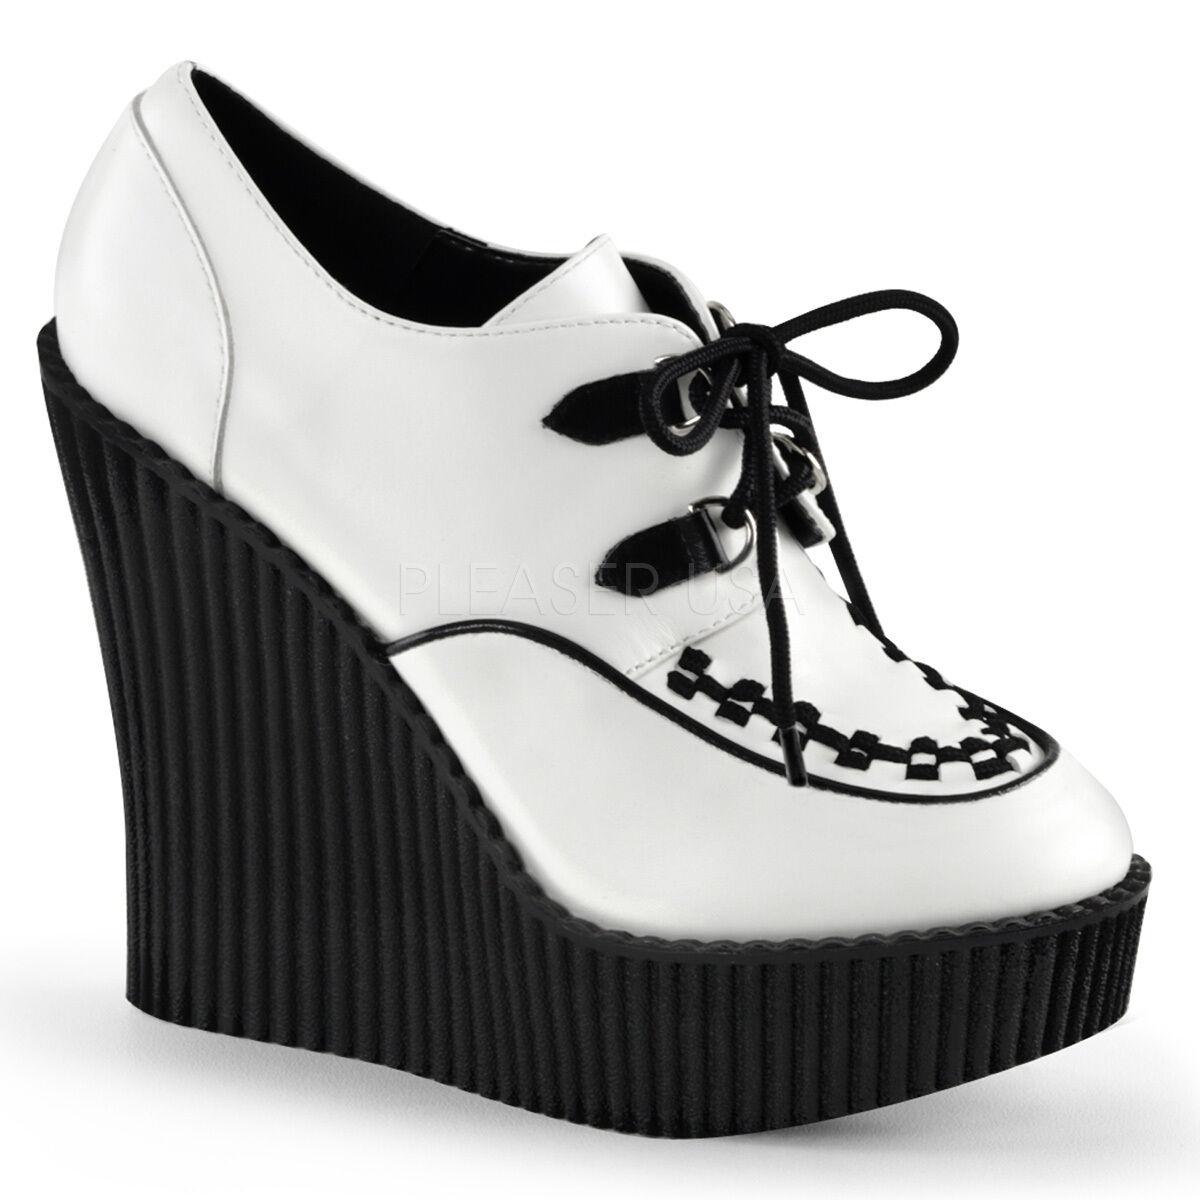 SALE DEMONIA White Black Lace Up Wedge Platform Creeper Women's shoes